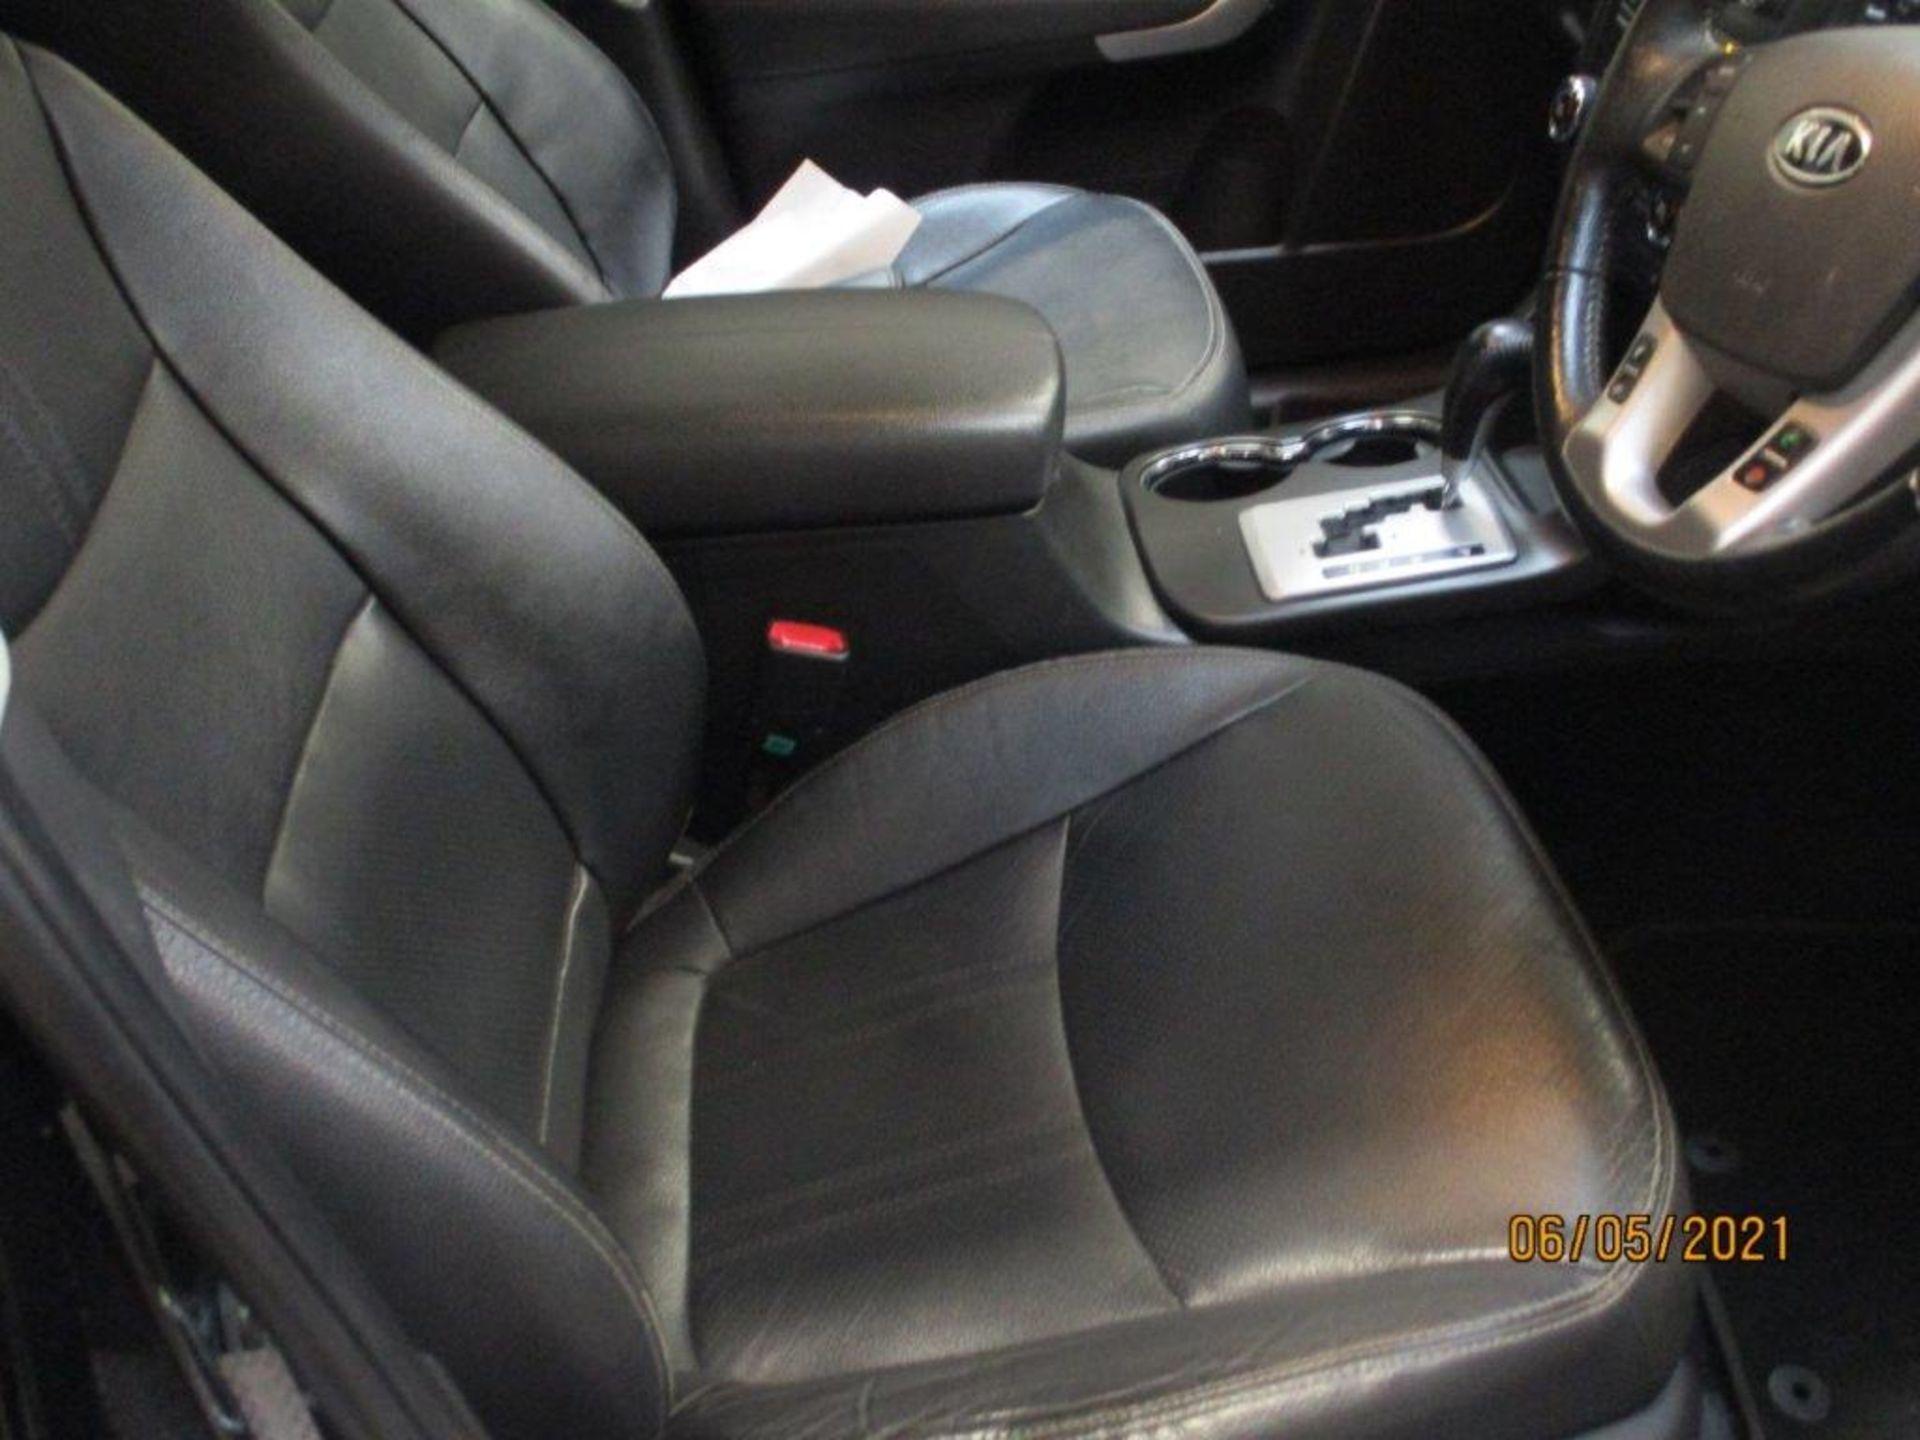 12 12 Kia Sorento KX2 CRDI Auto - Image 13 of 24